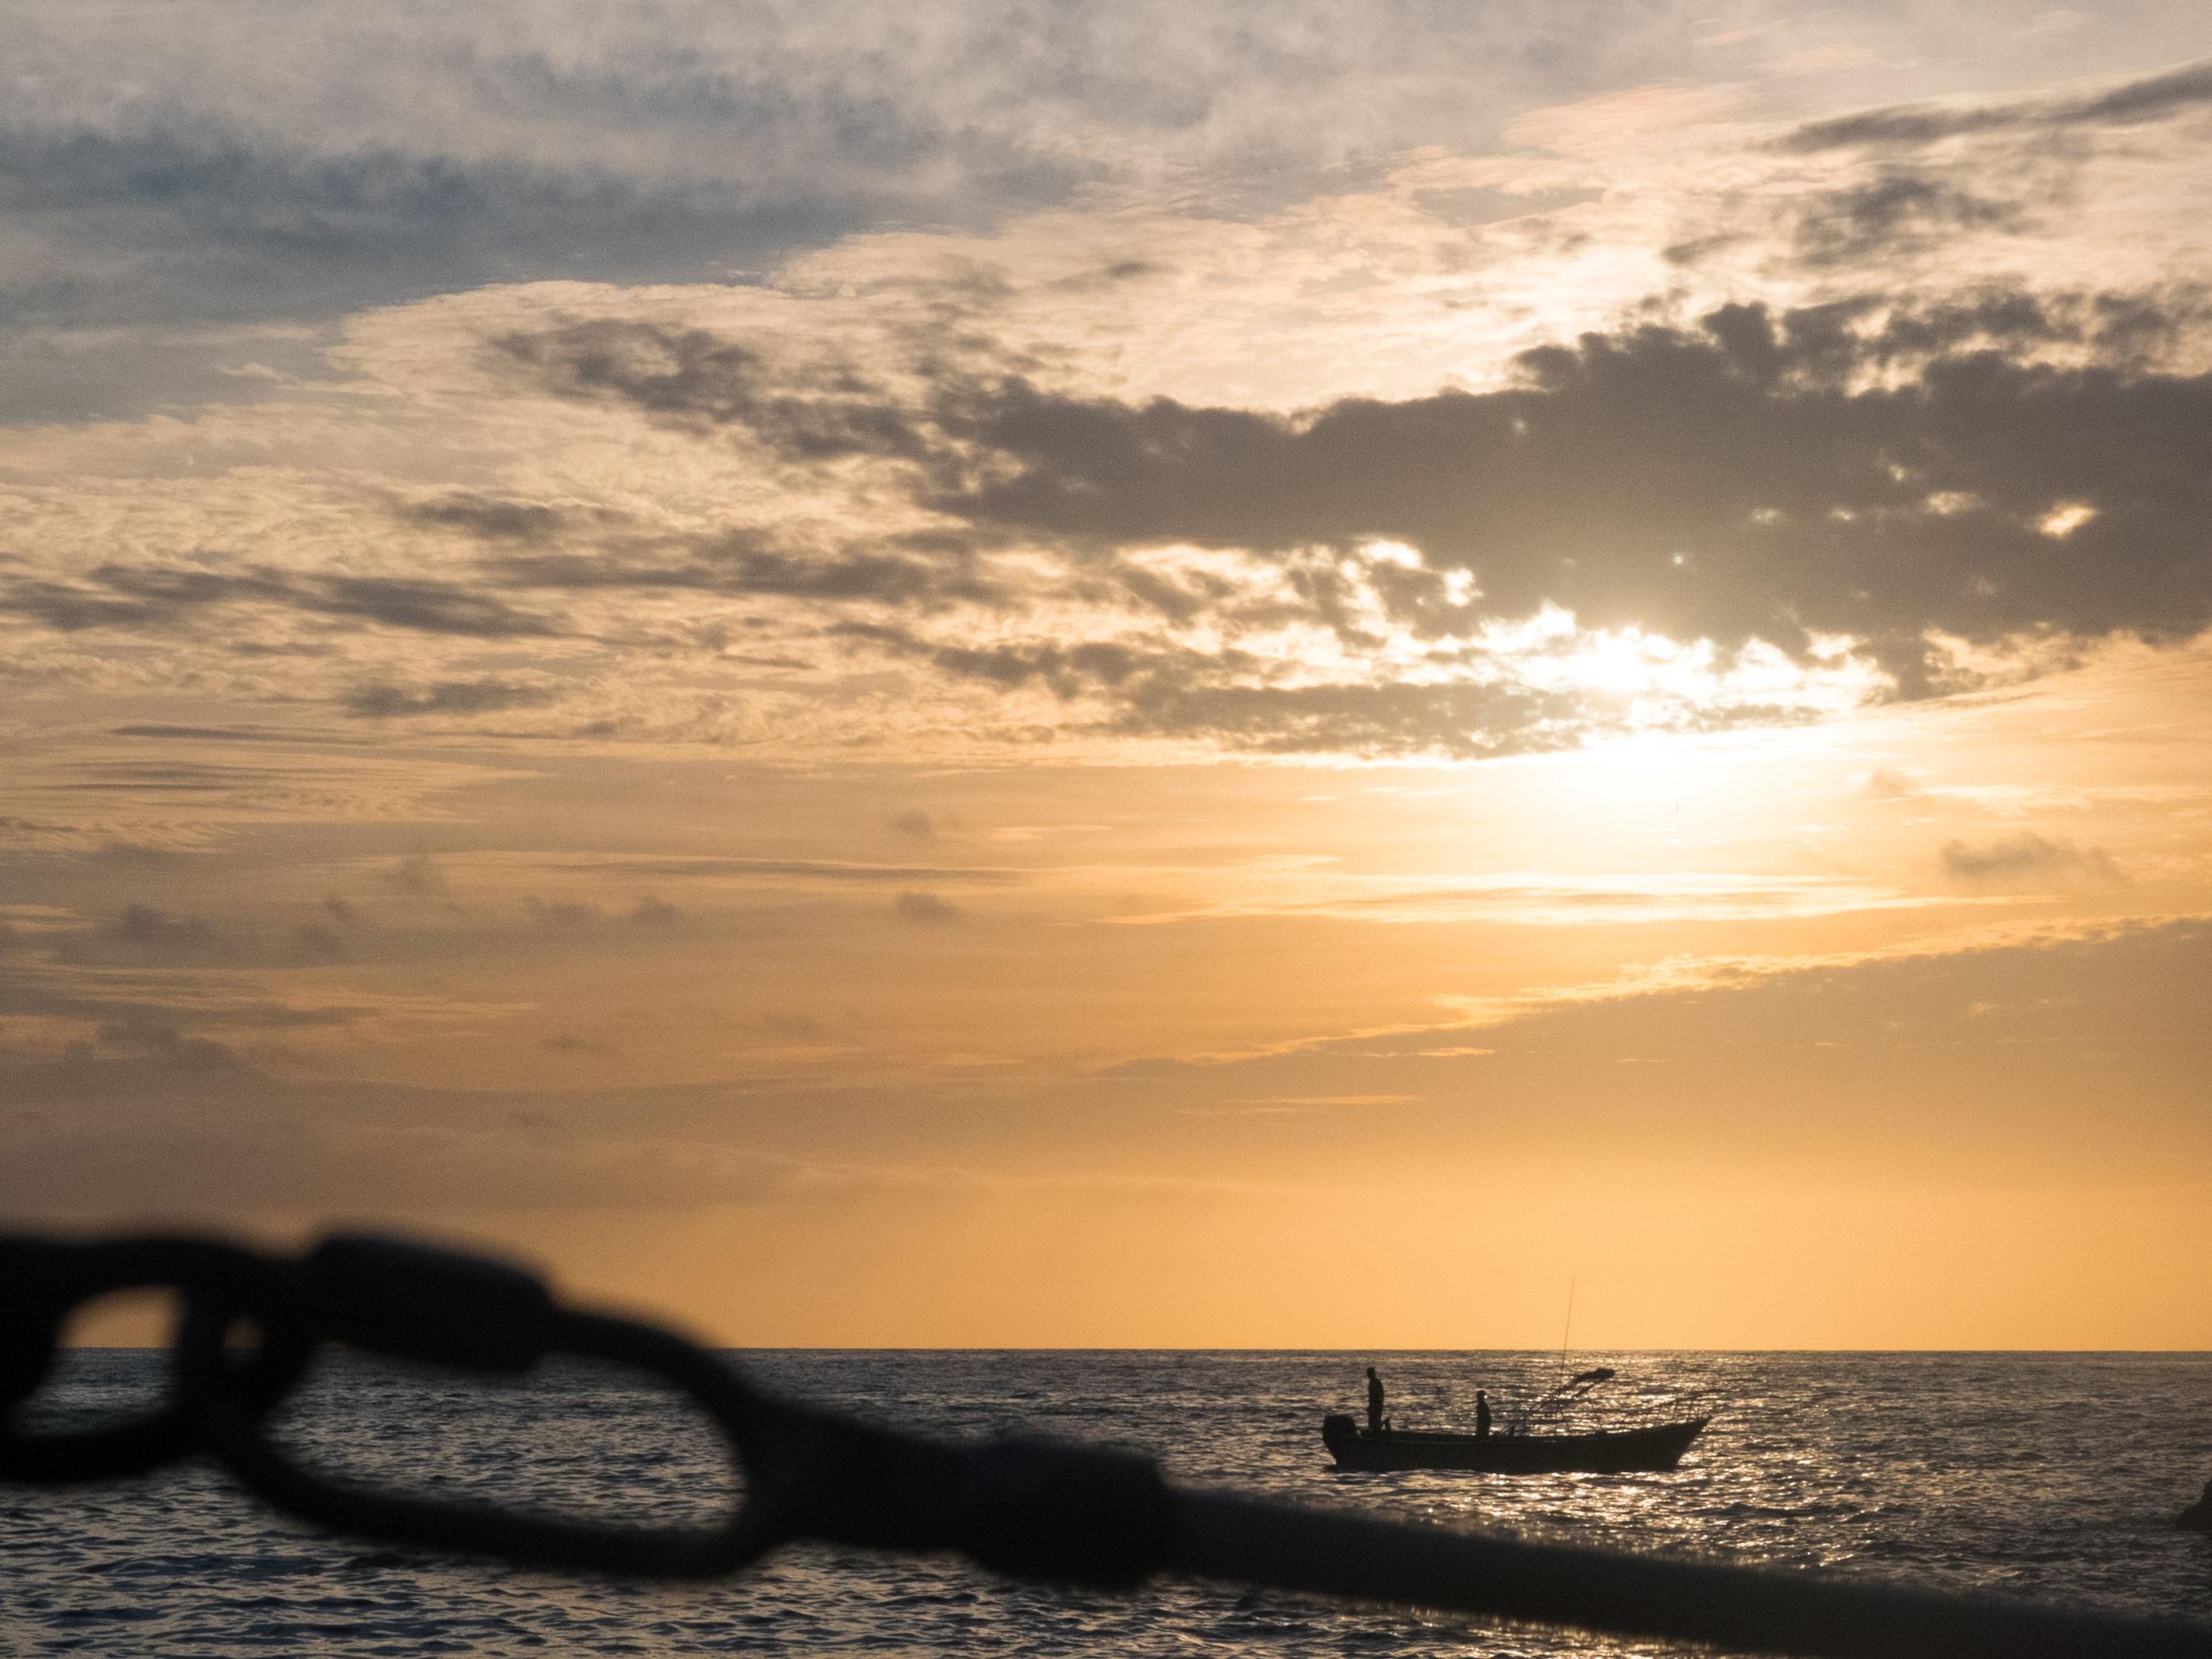 sea, horizon over water, sunset, water, sky, scenics, tranquil scene, beauty in nature, tranquility, beach, nature, orange color, idyllic, cloud - sky, silhouette, shore, sun, cloud, seascape, nautical vessel